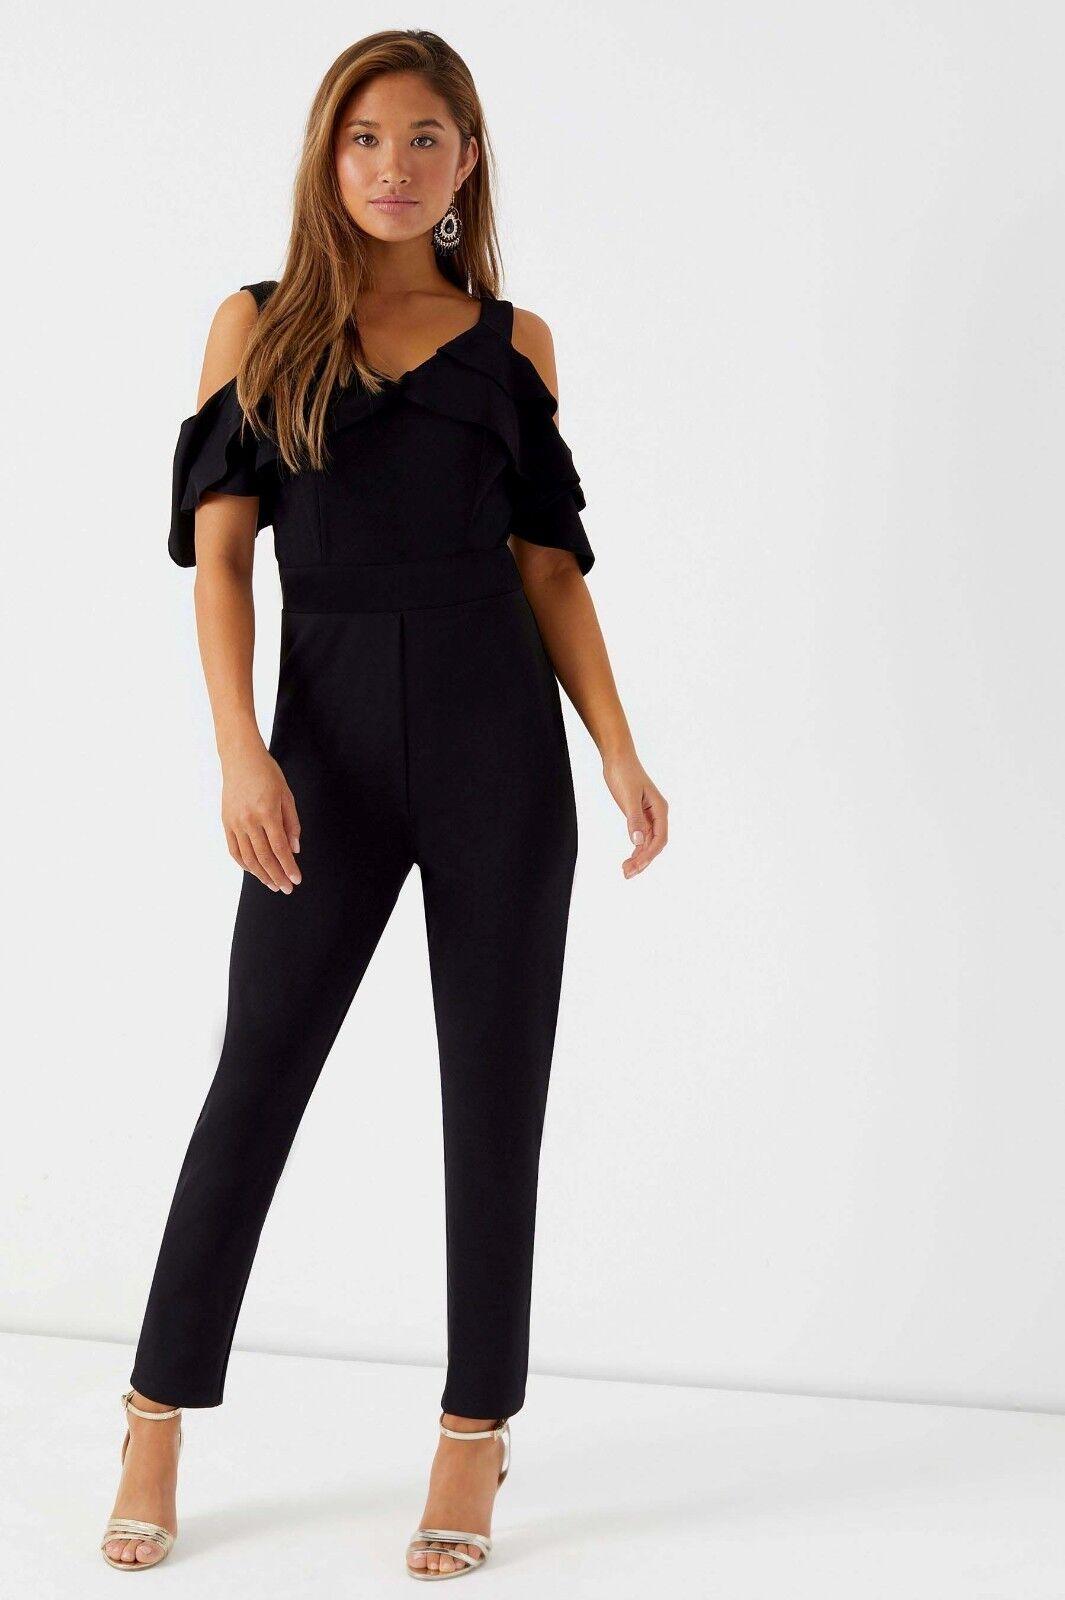 Lipsy Cold Shoulder Wide Leg Jumpsuit - Size UK10 , BNWT